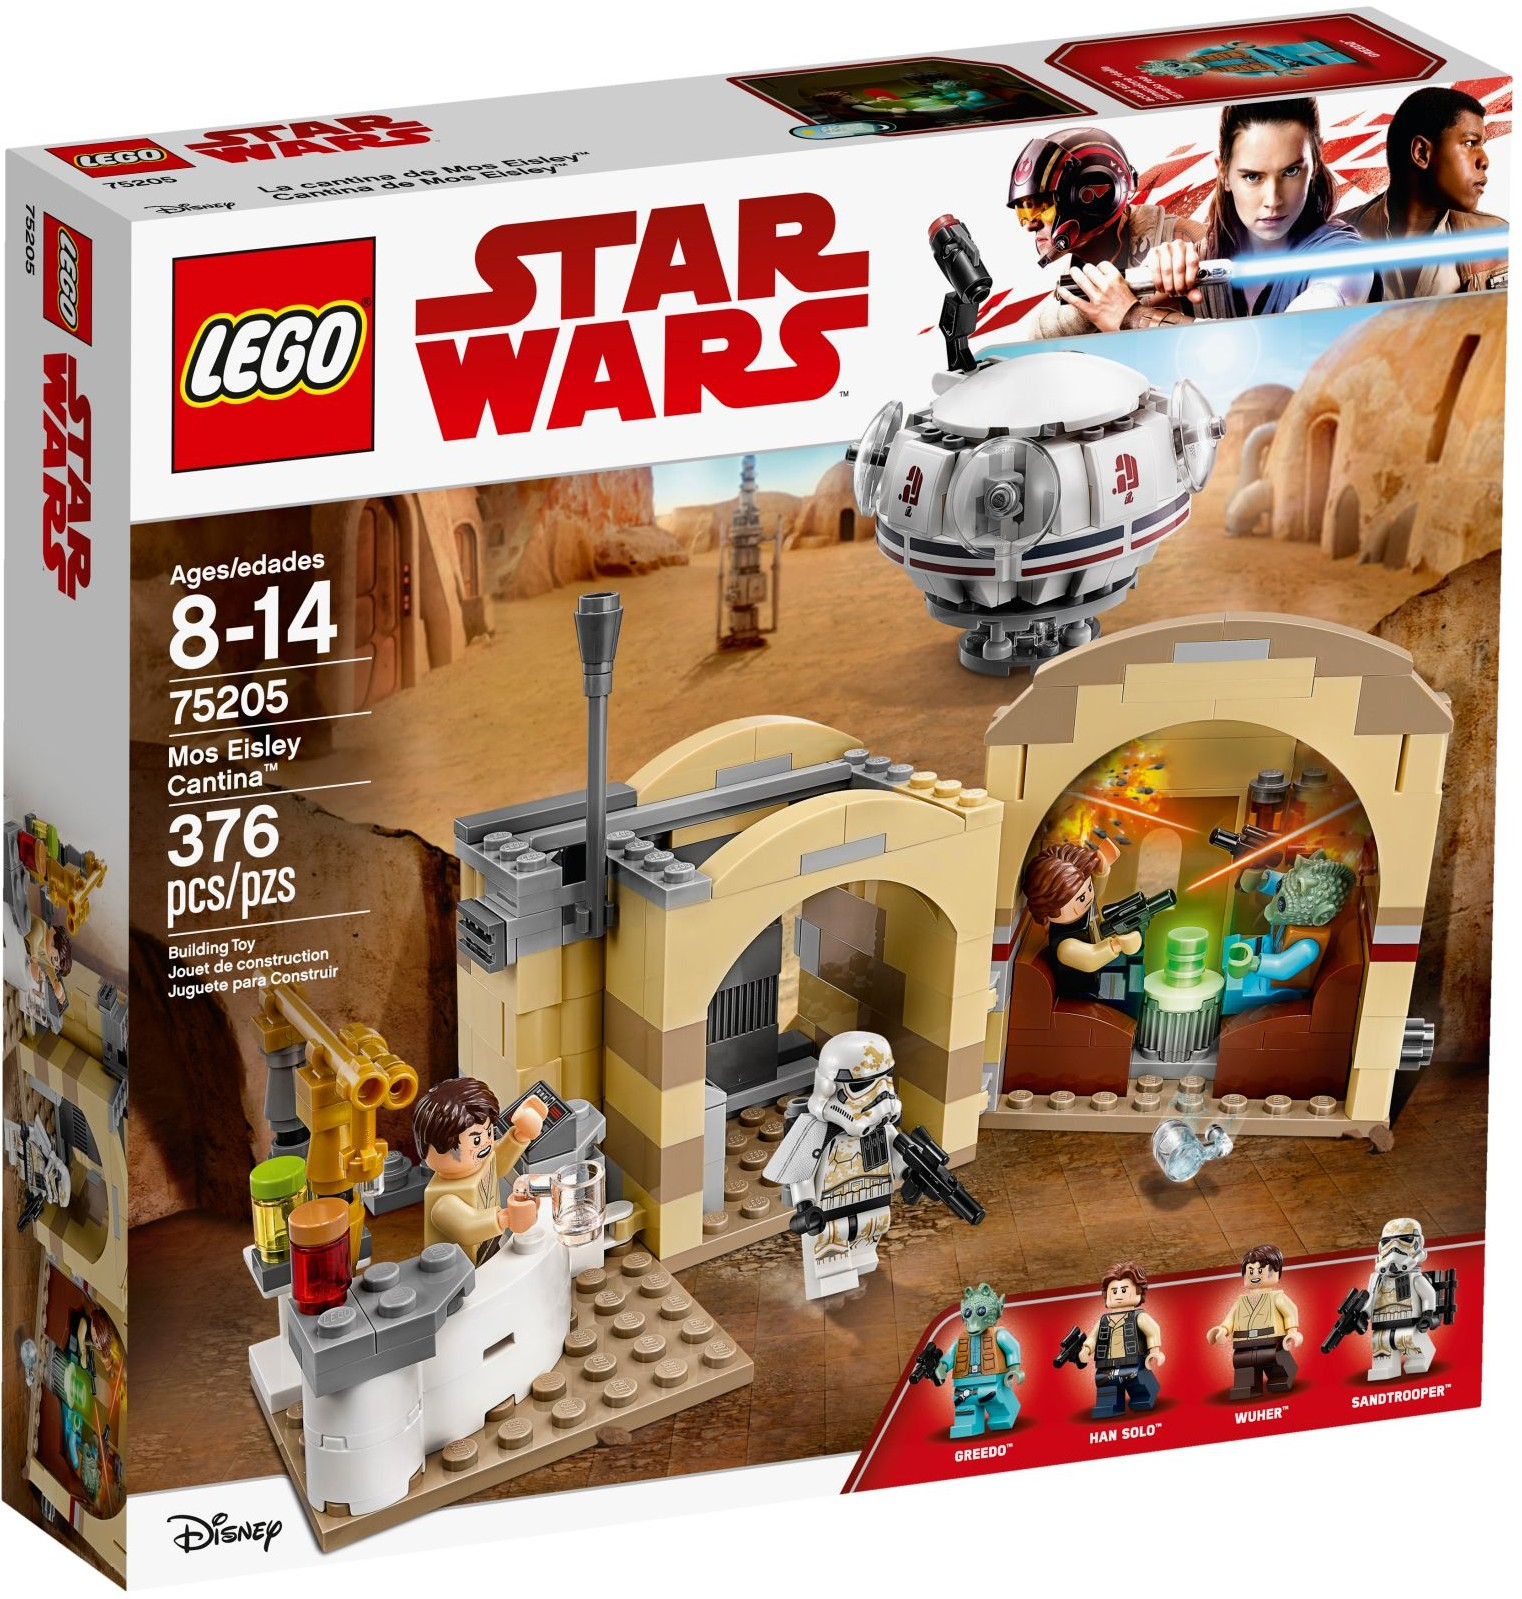 75205. LEGO Star Wars Mos Eisley Cantina